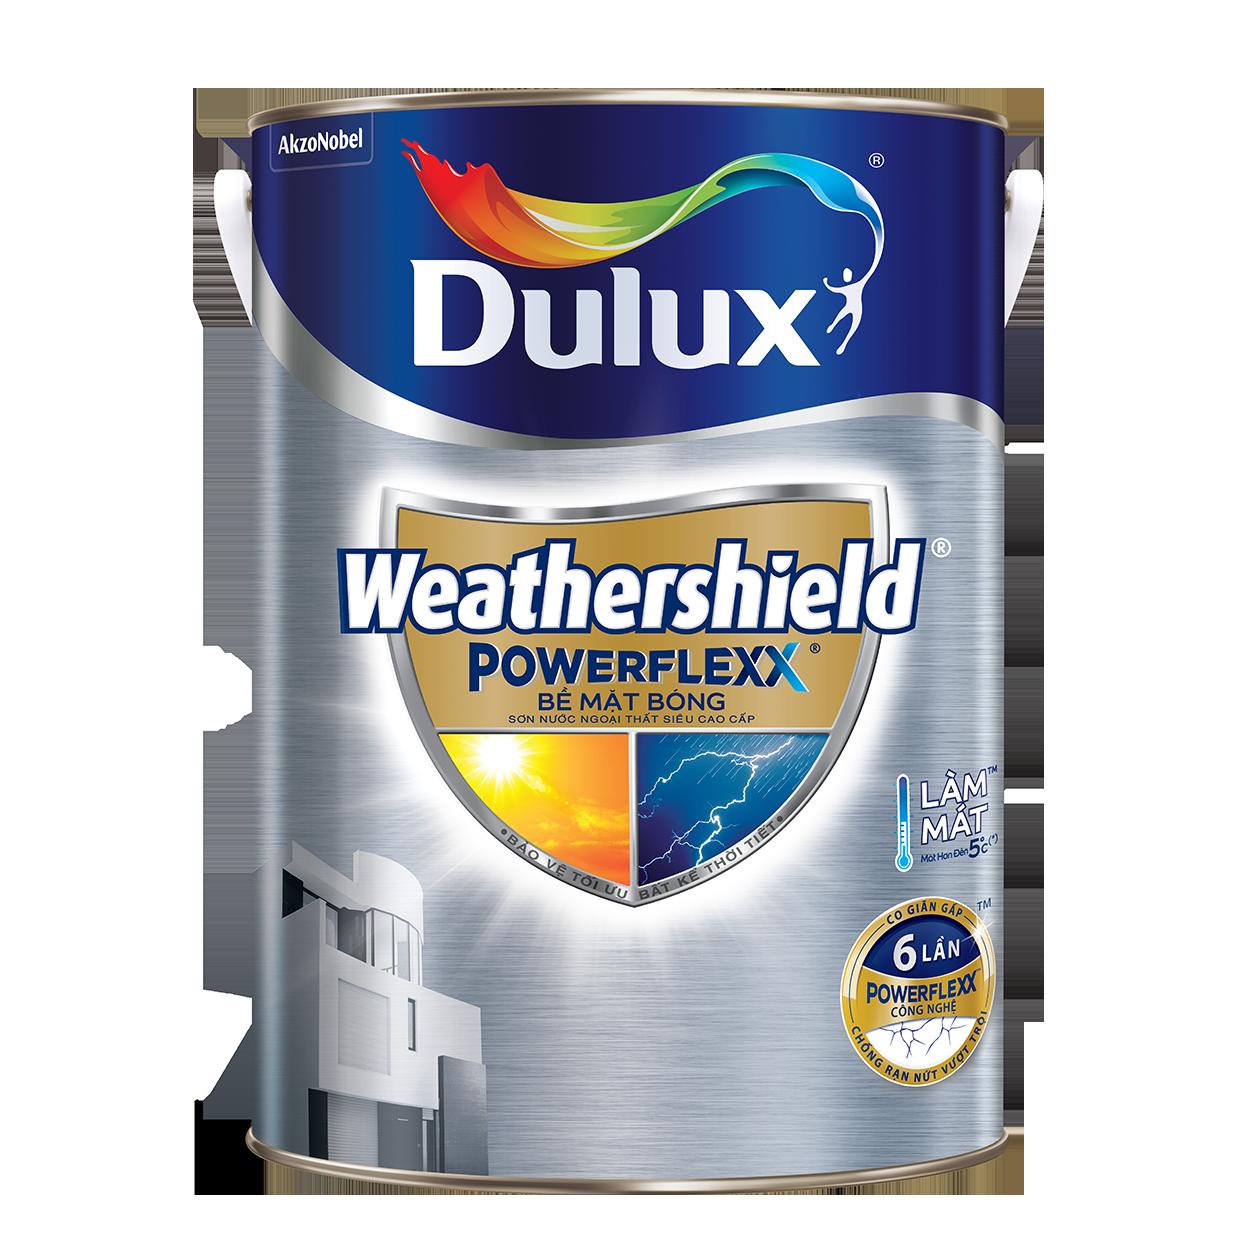 Dulux Weathershield Powerflexx Bề Mặt Bóng